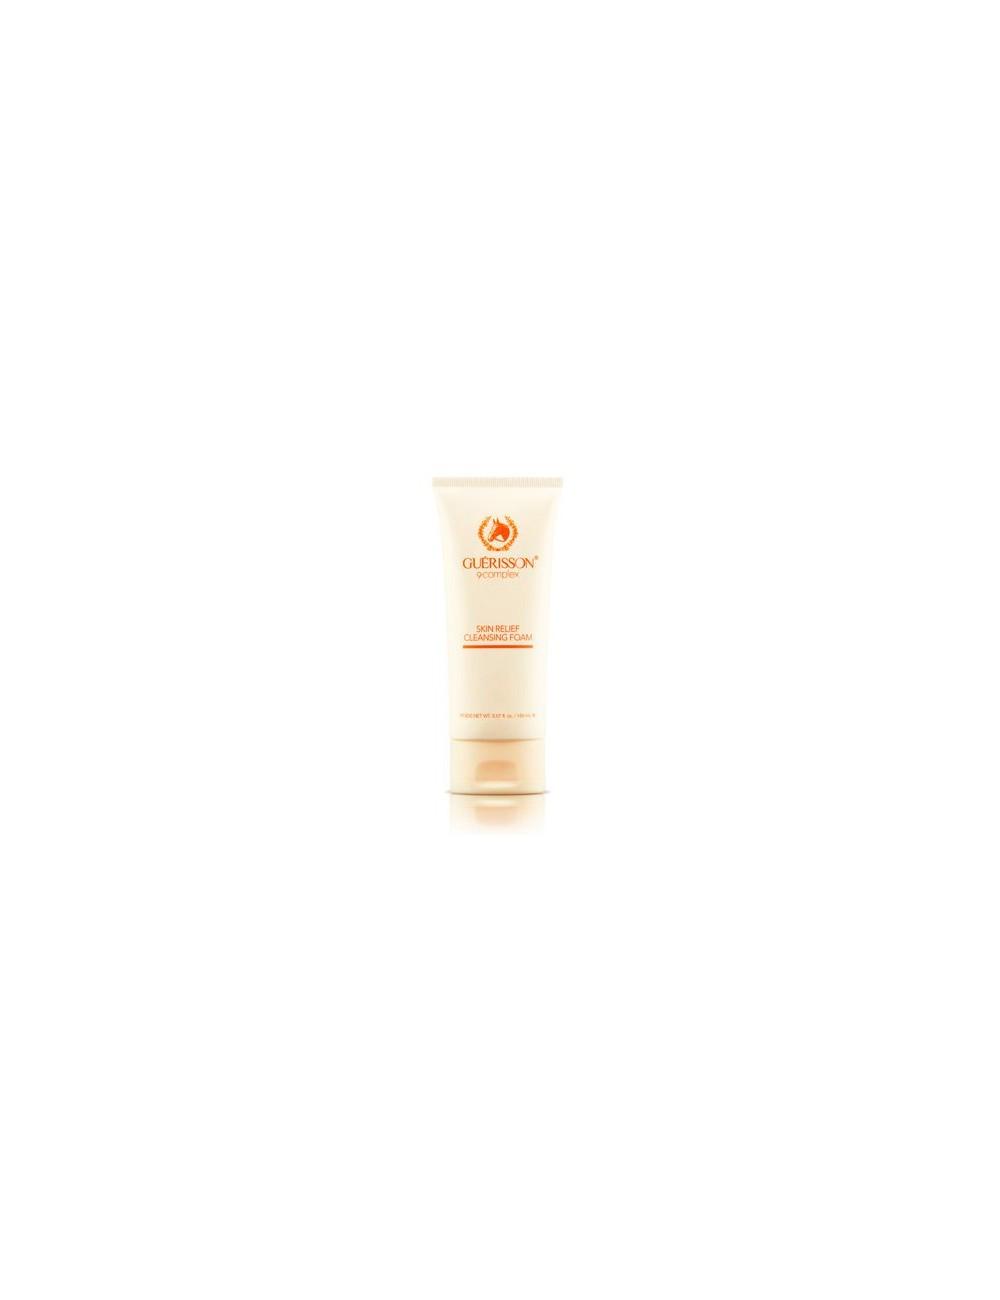 Espuma Limpiadora Guerisson 9 Complex Skin Relief Cleansing Foam